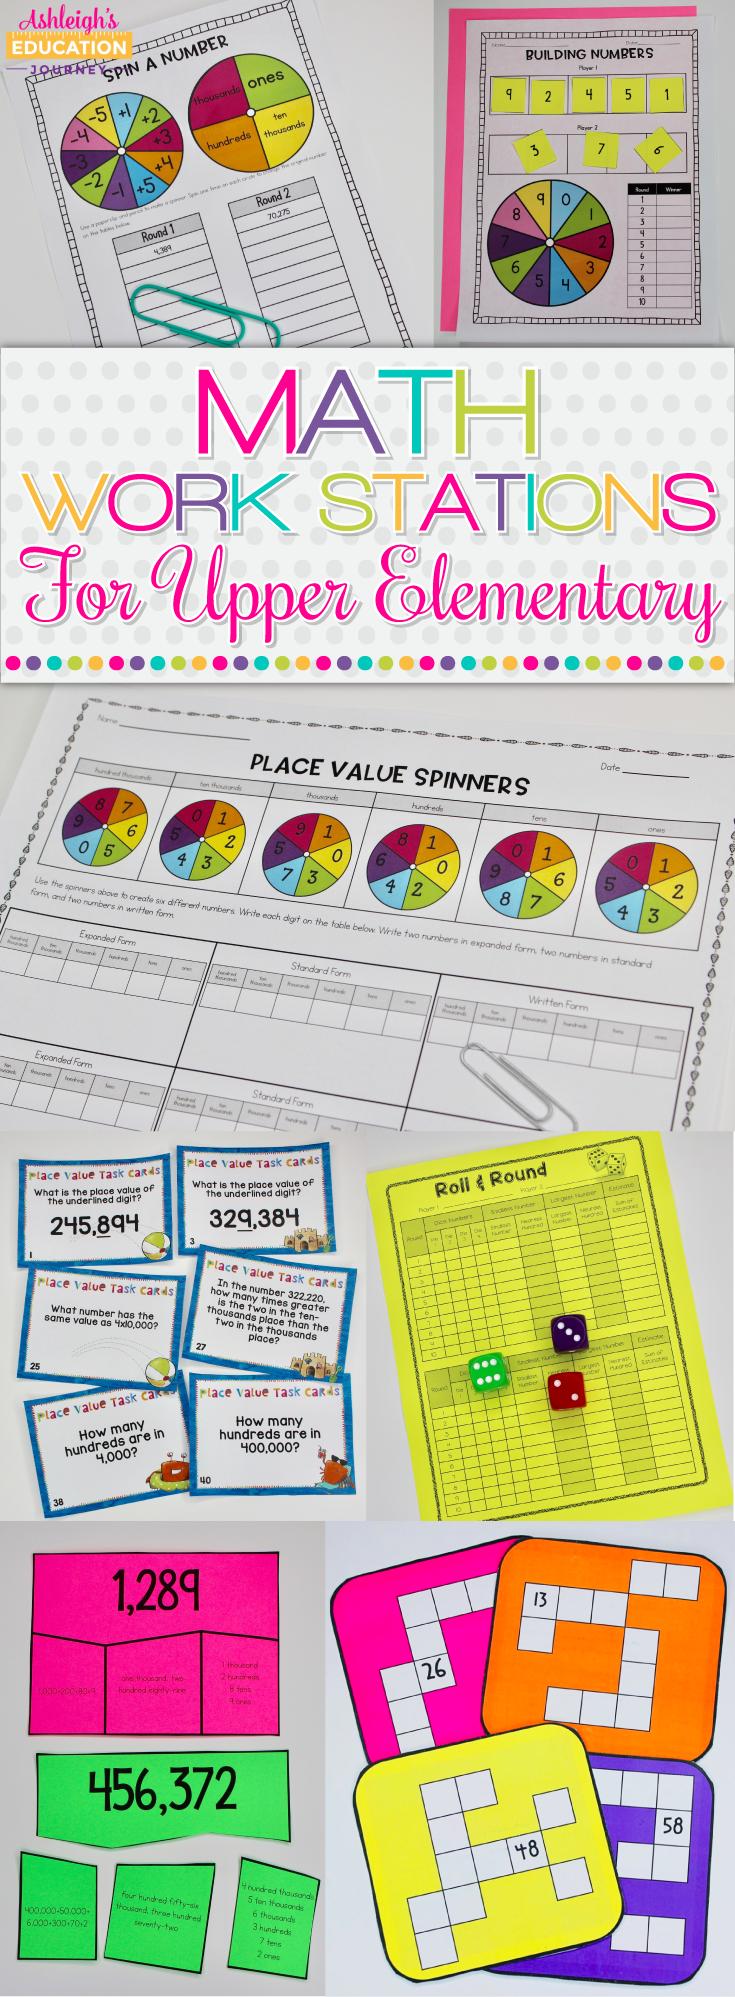 Math Work Stations for Upper Elementary - Ashleigh's Education Journey